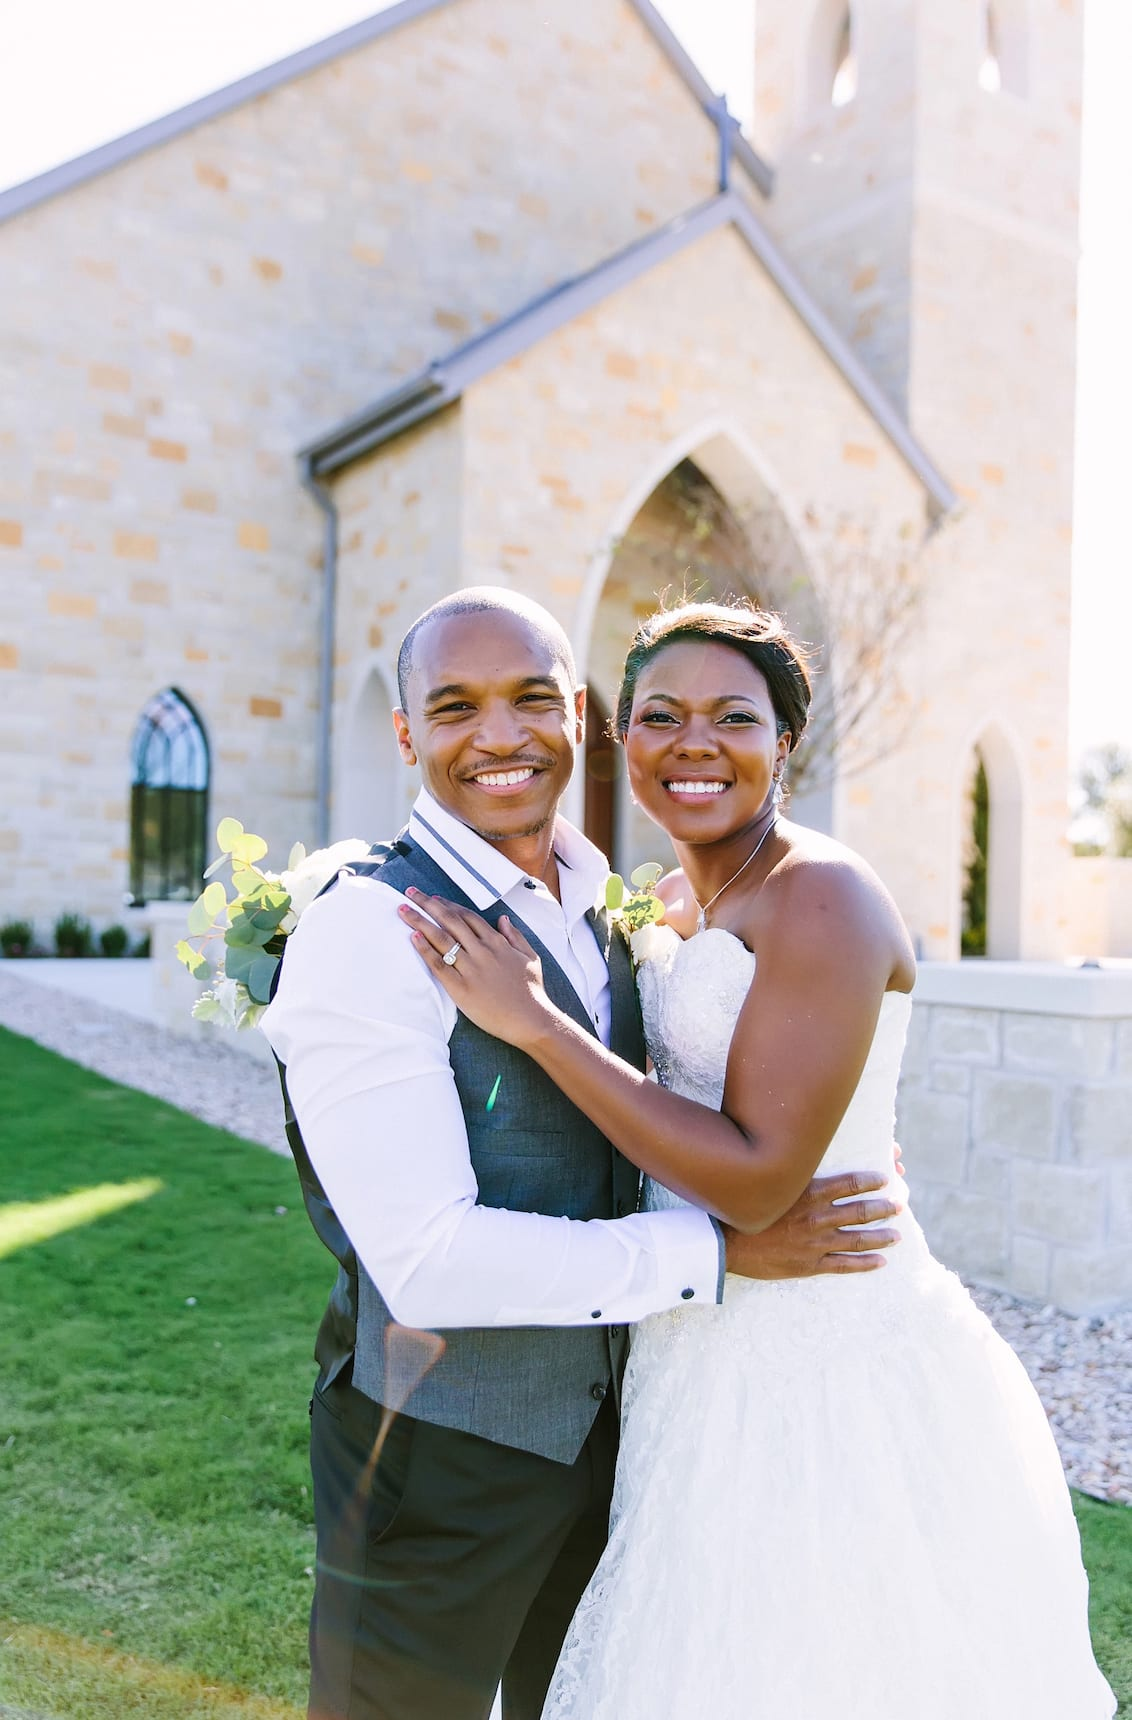 View More: http://anastasiastrate.pass.us/carmen-and-leonard-wedding-1